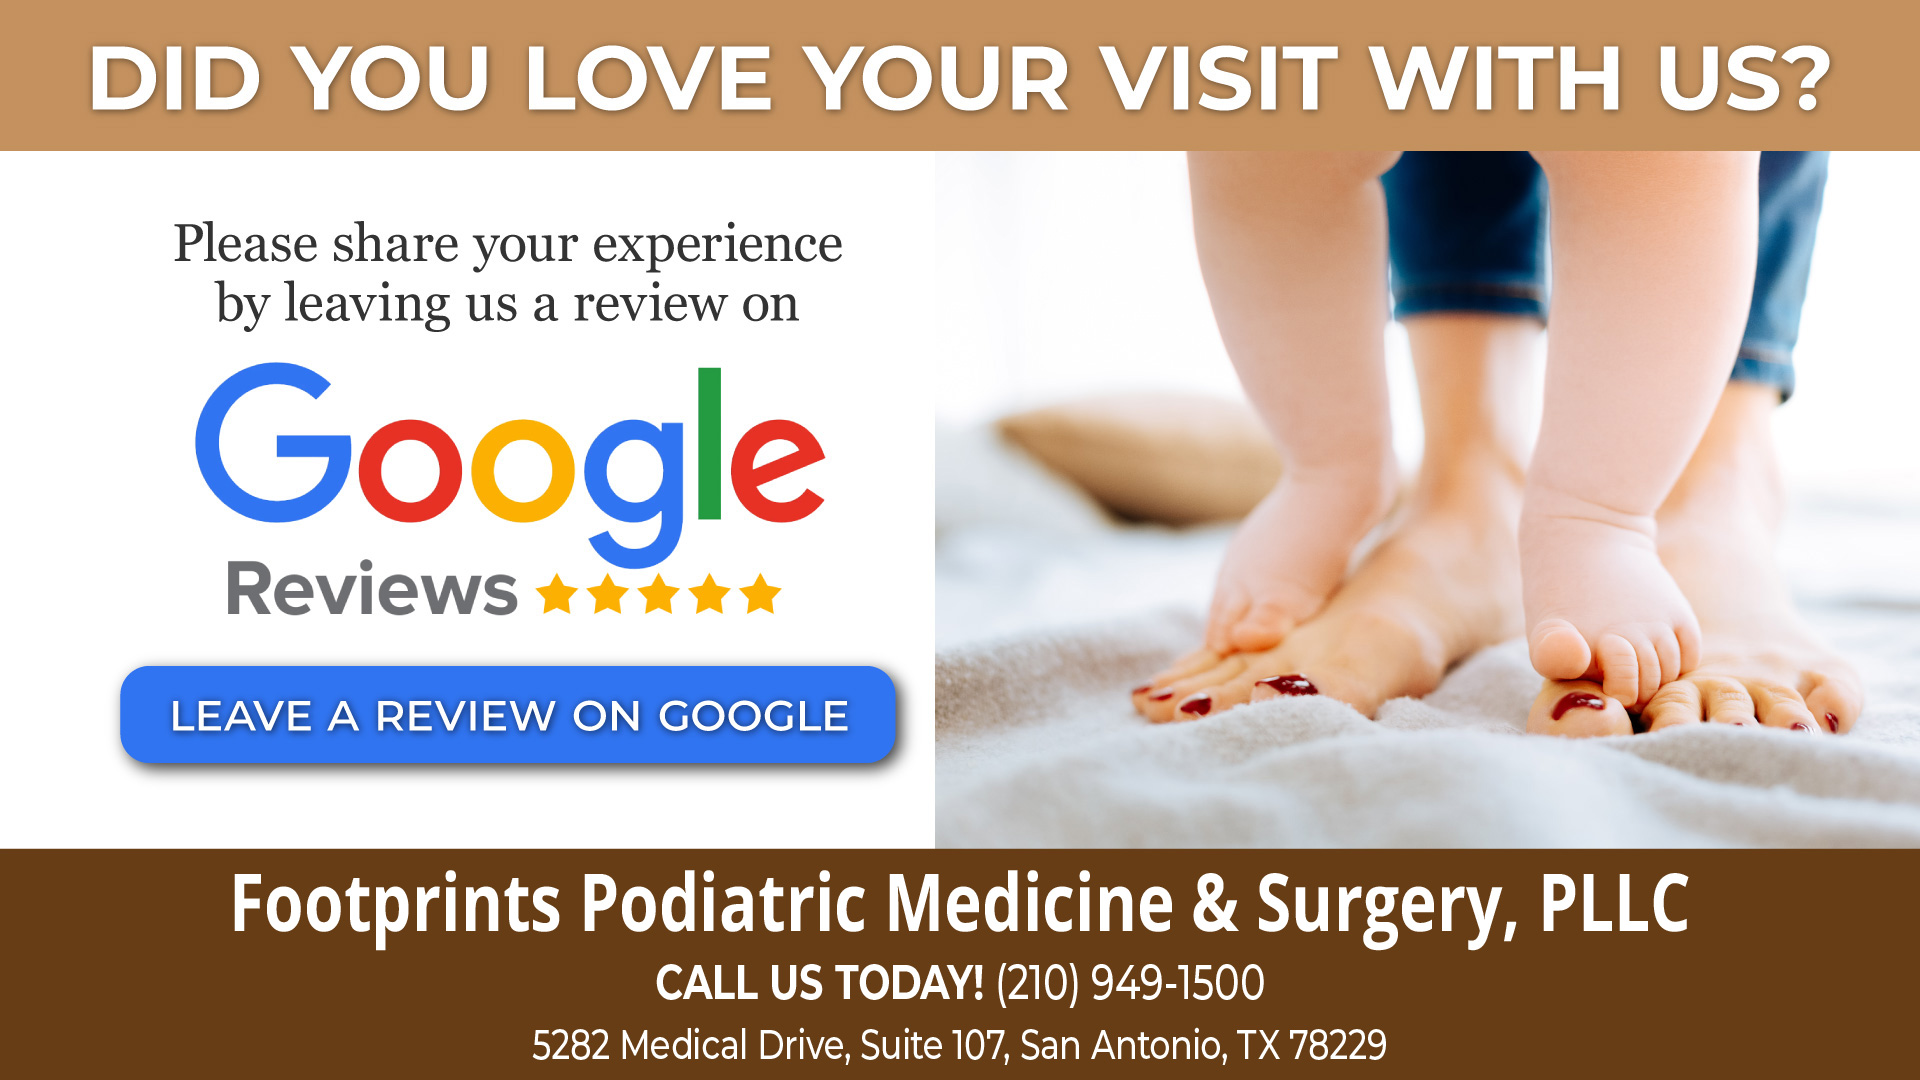 Review Us | Footprints Podiatric Medicine & Surgery, PLLC